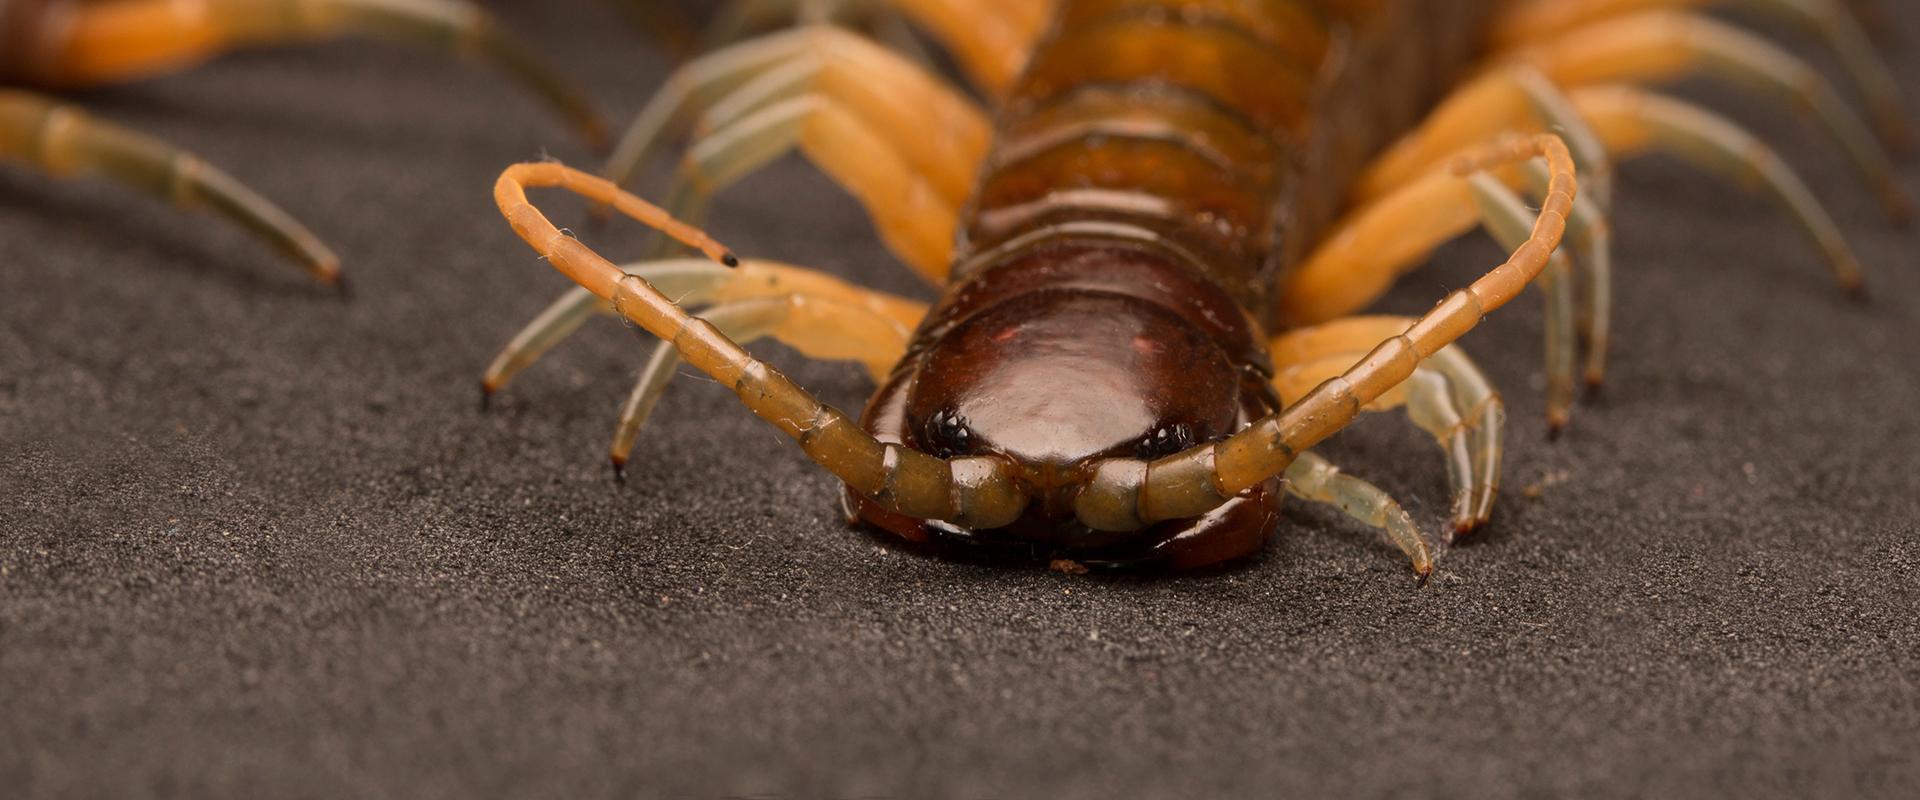 a close up of a centipede